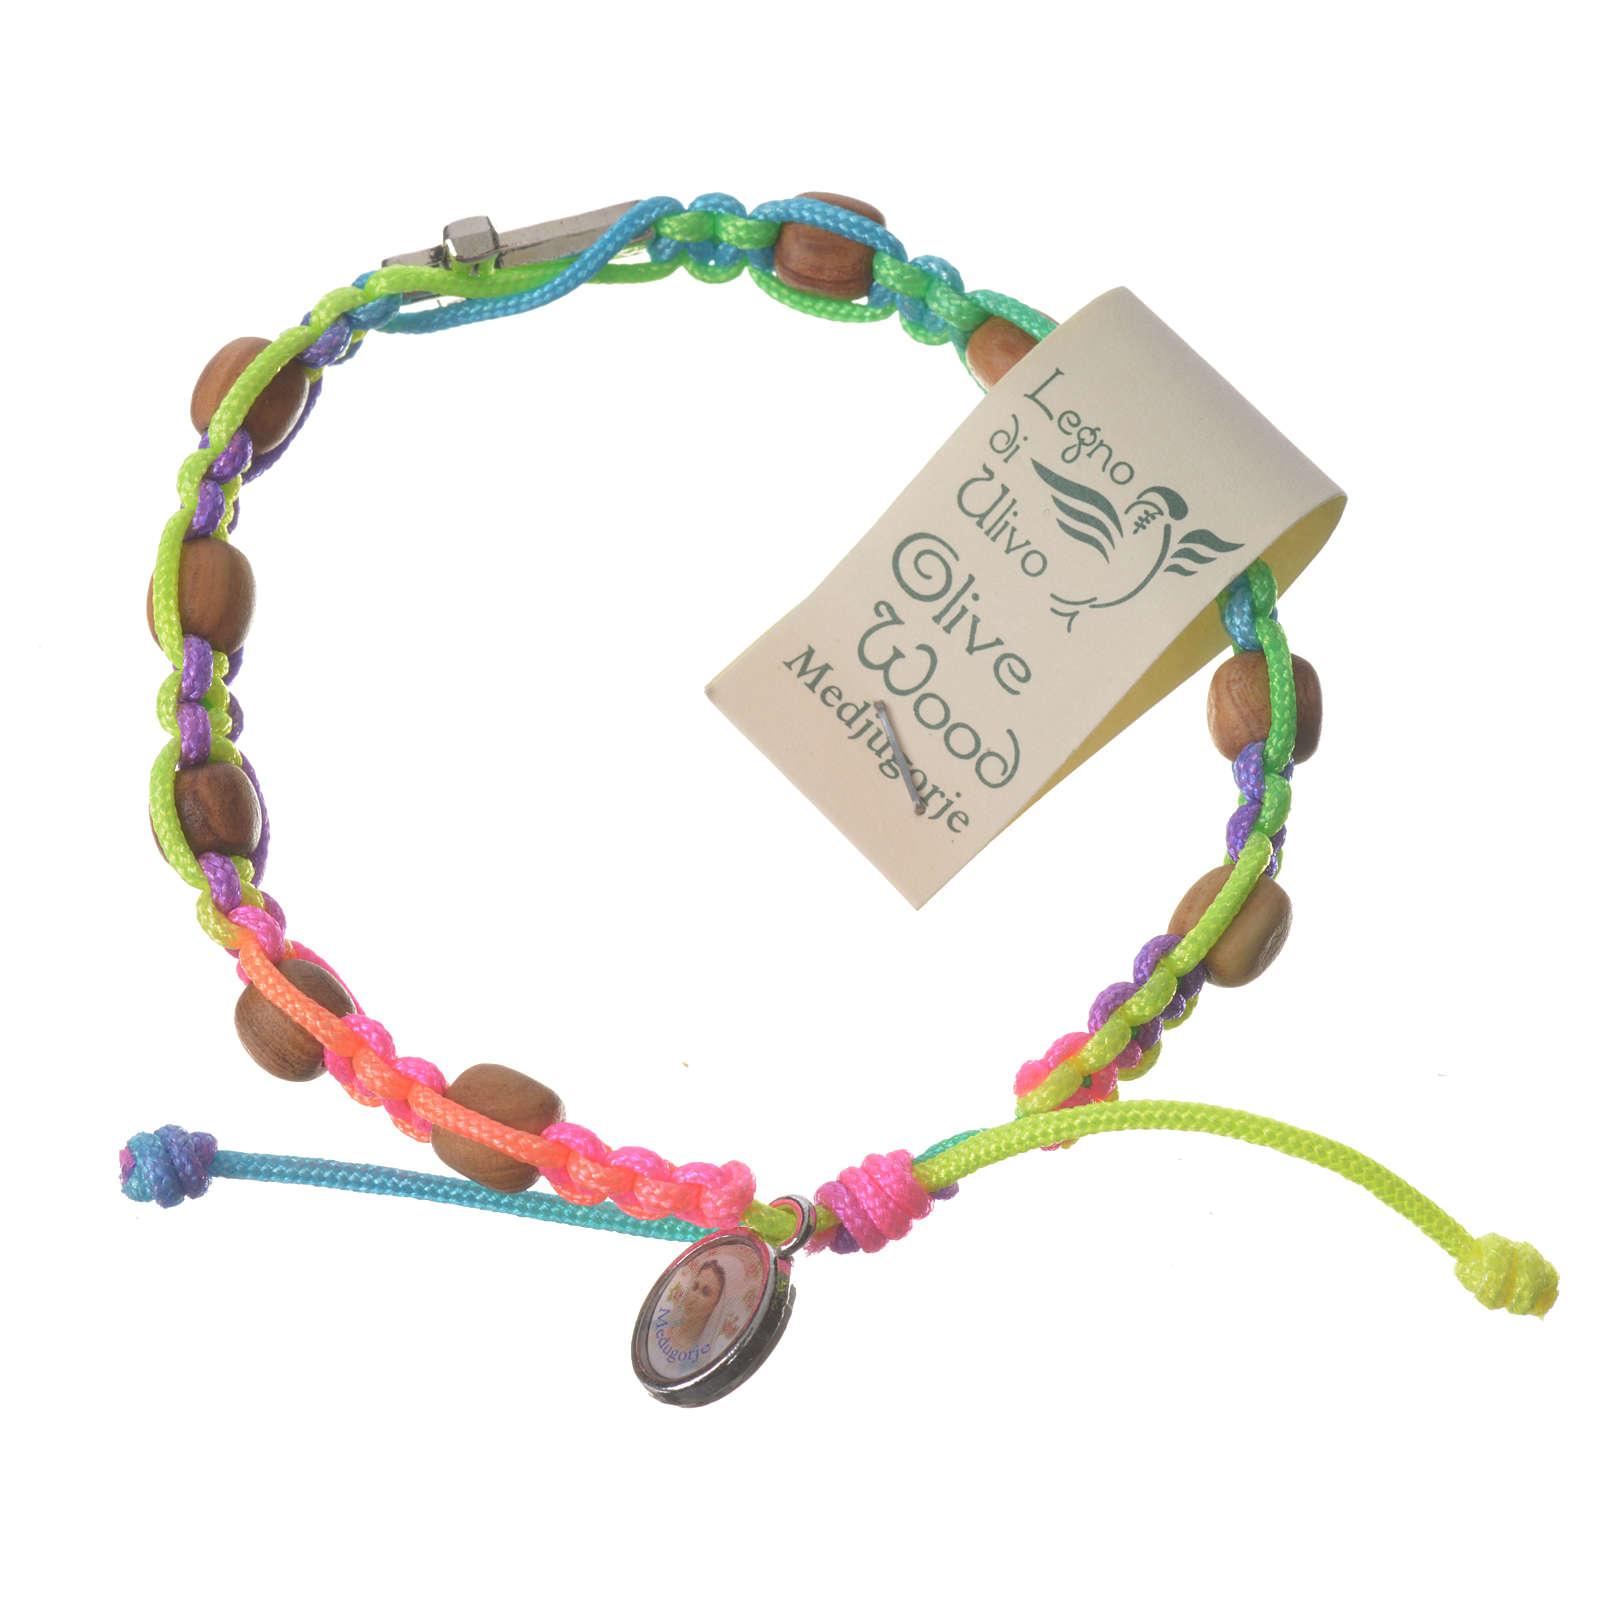 Pulseira Medjugorje fio multicolor contas oliveira 4